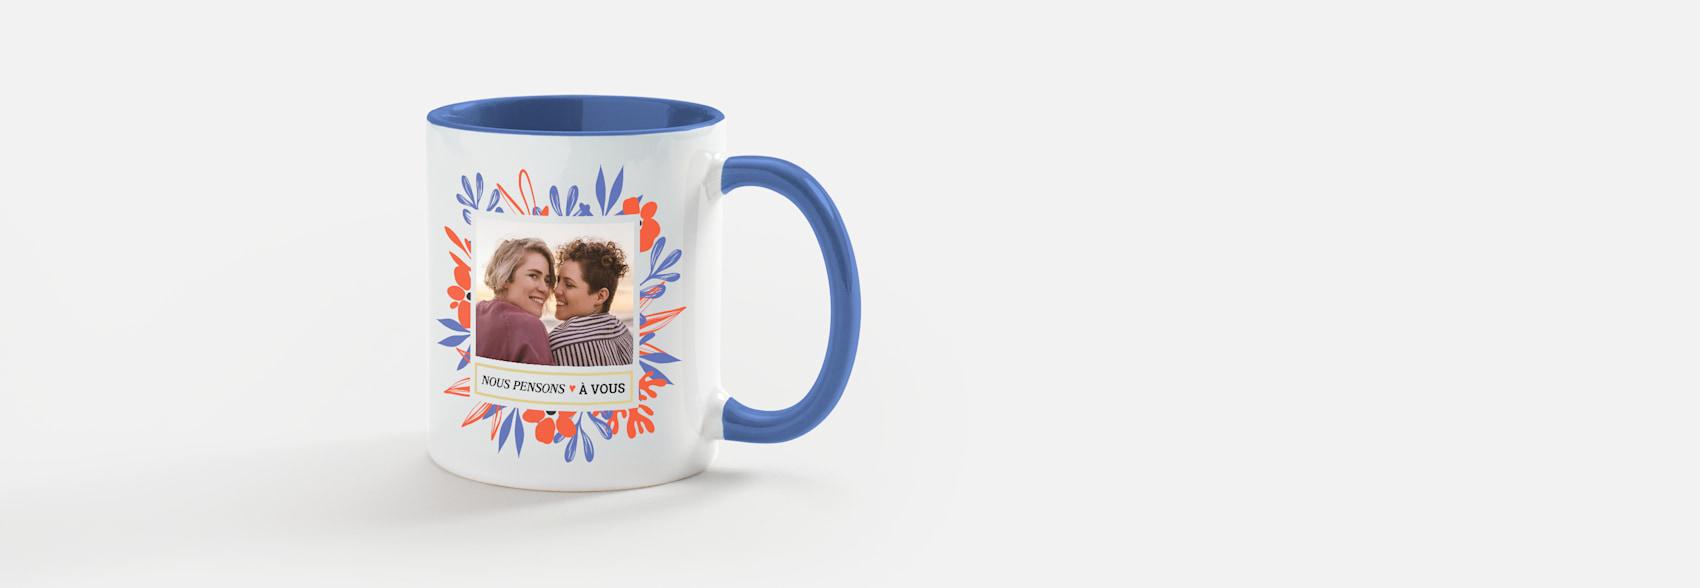 tasses personnalisées canada